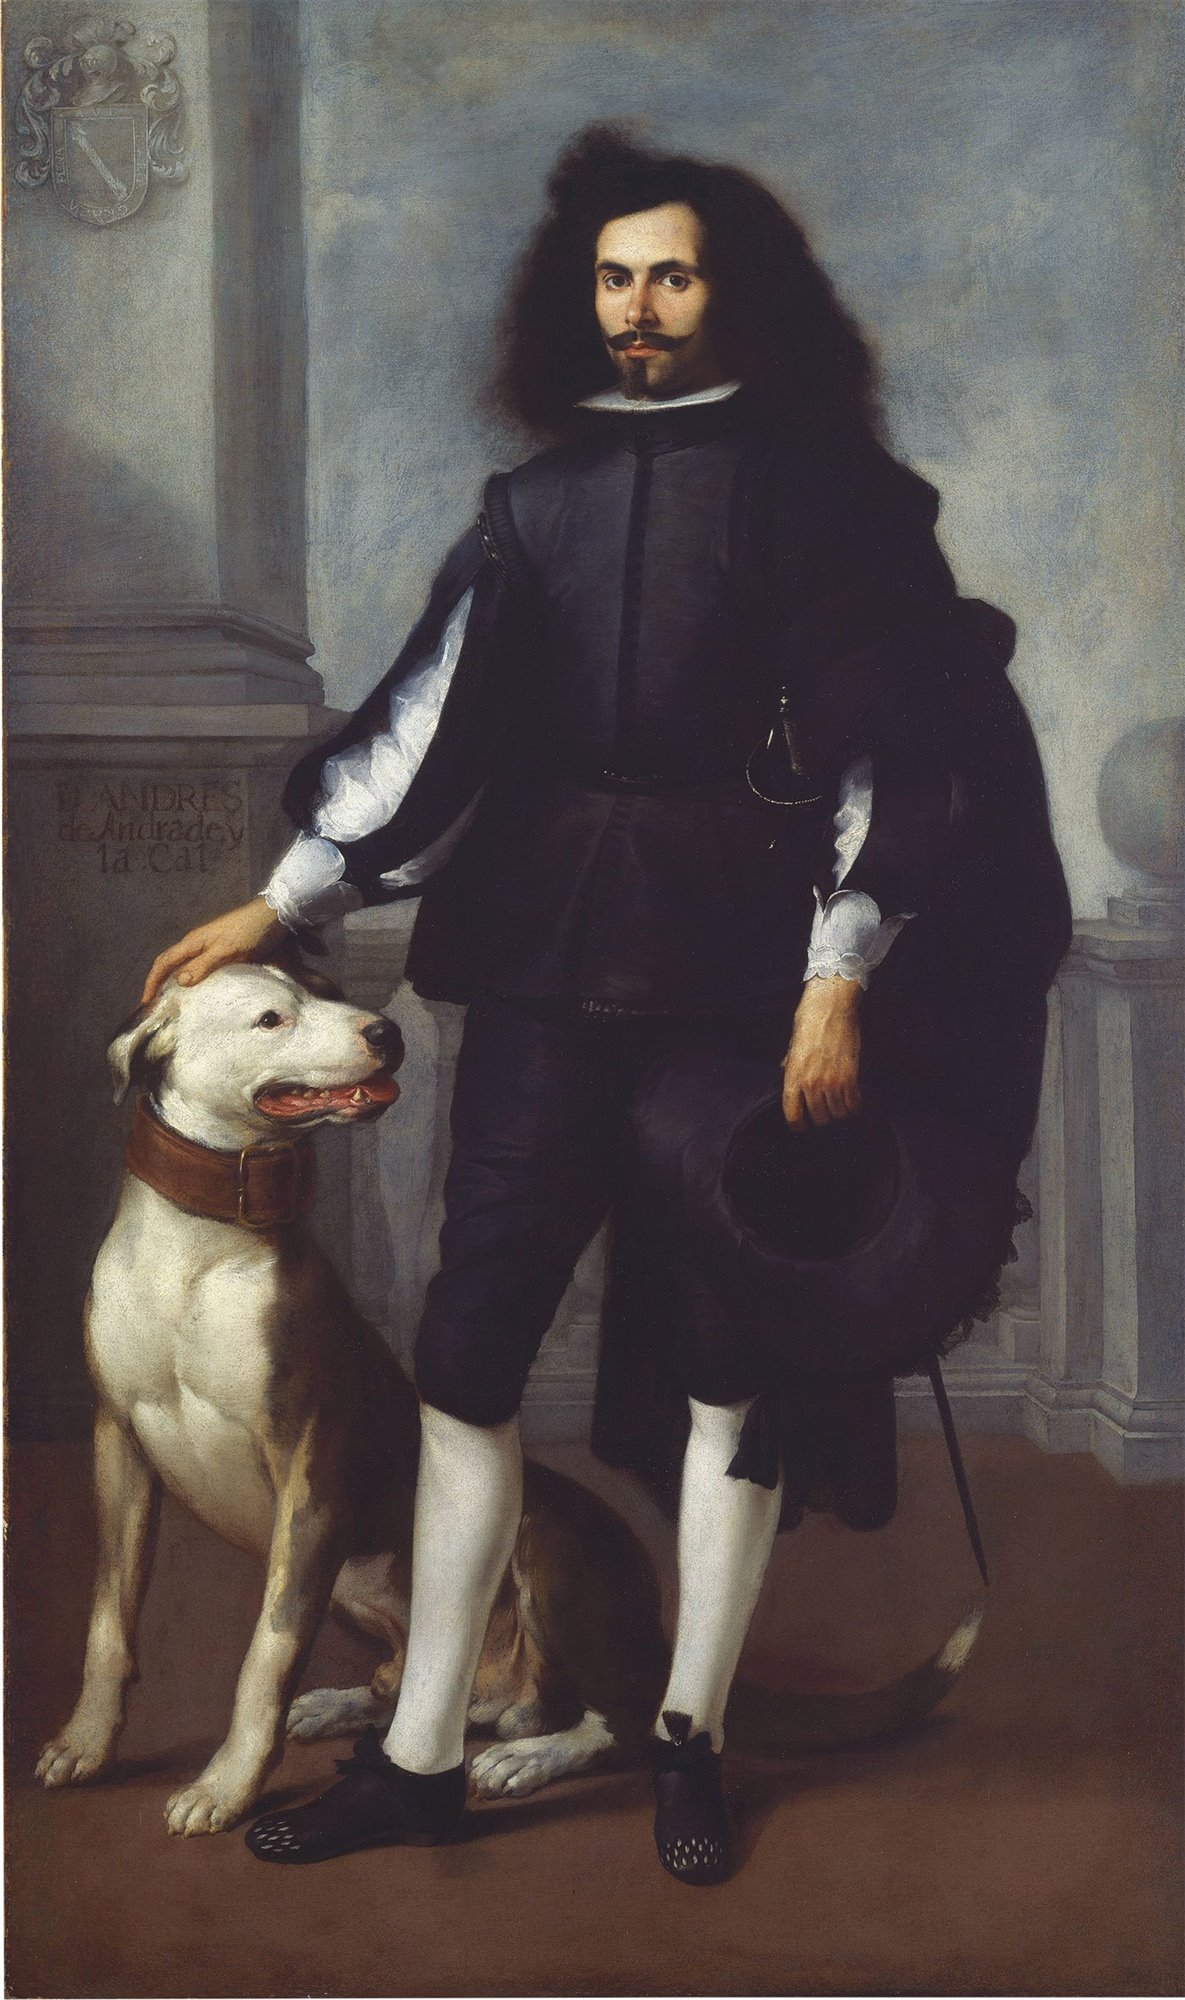 don-andres-de-andrade-obra-murillo. Don Andrés de Andrade. Murillo. 1656-1660. Museo Metropolitano, Nueva York